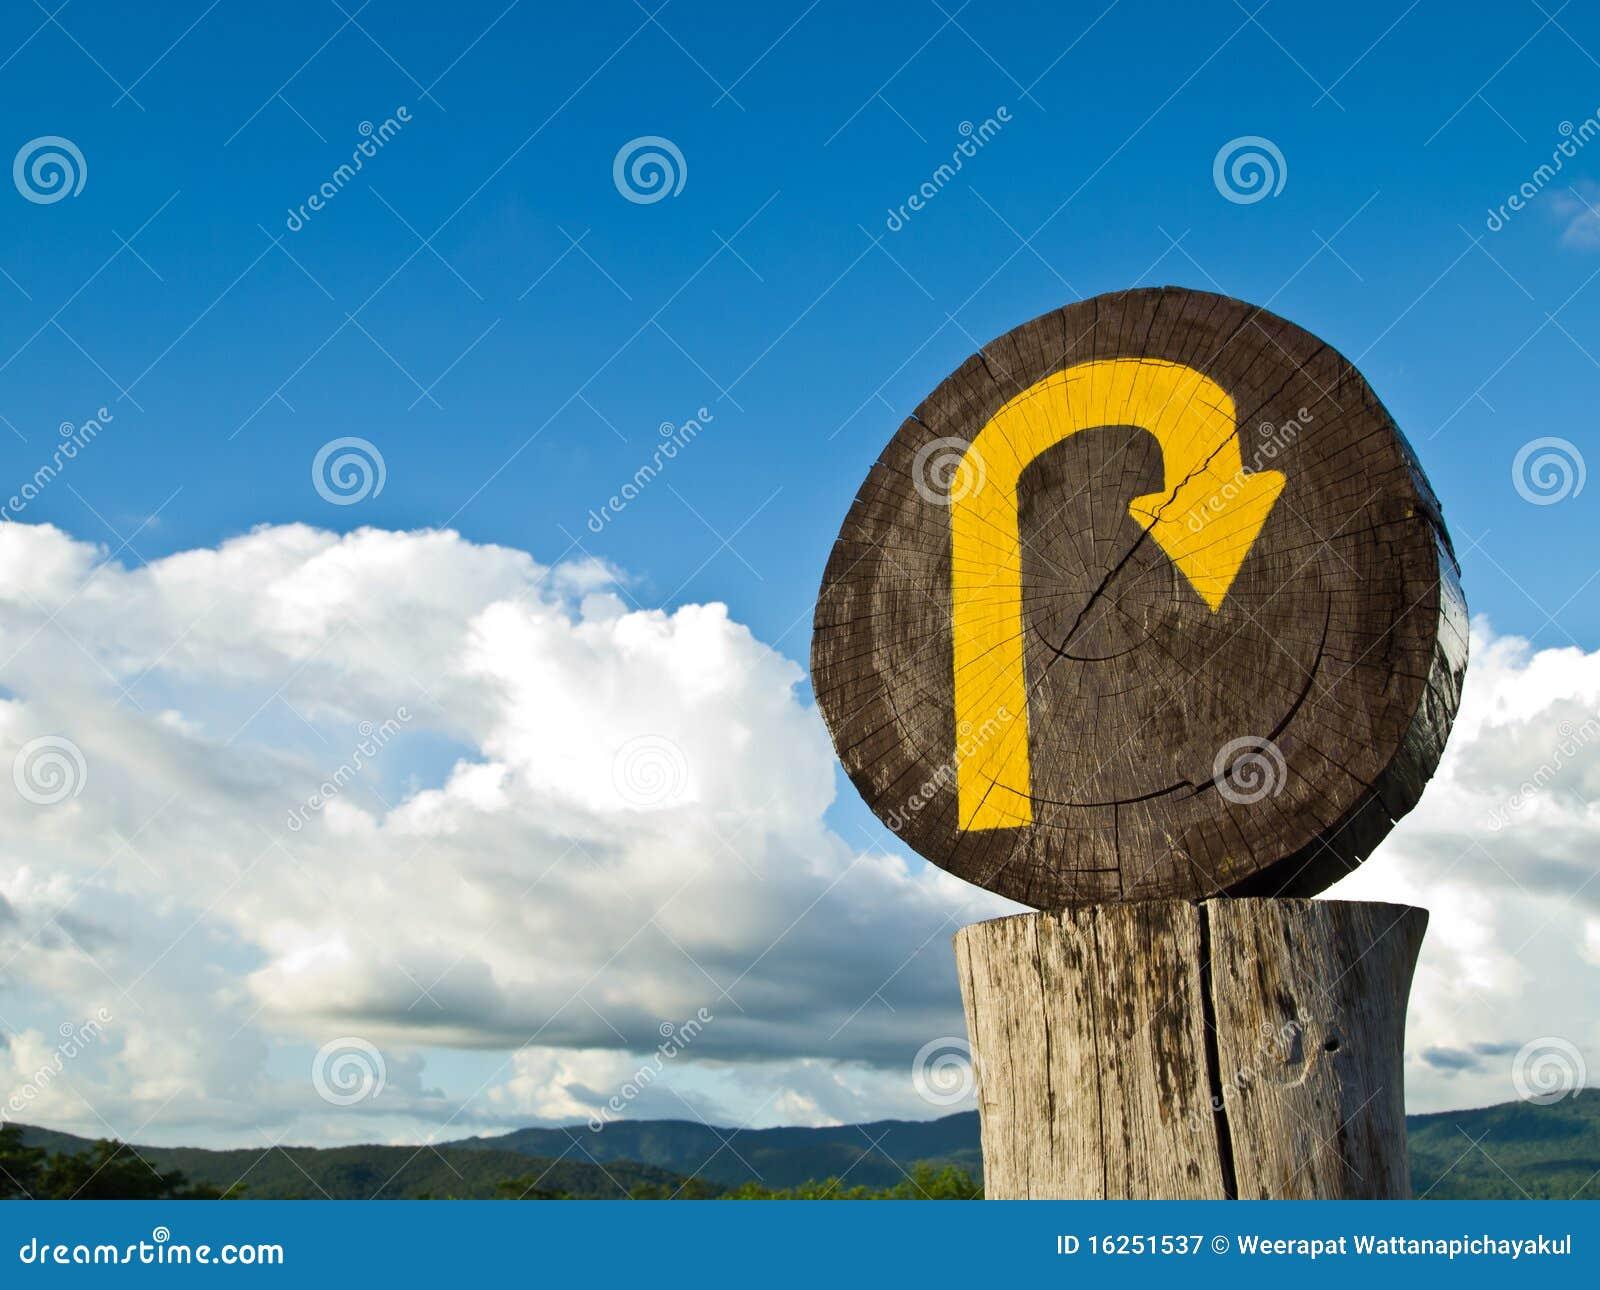 Turn around sign stock image image 35488961 - U Turn Sign Royalty Free Stock Photography